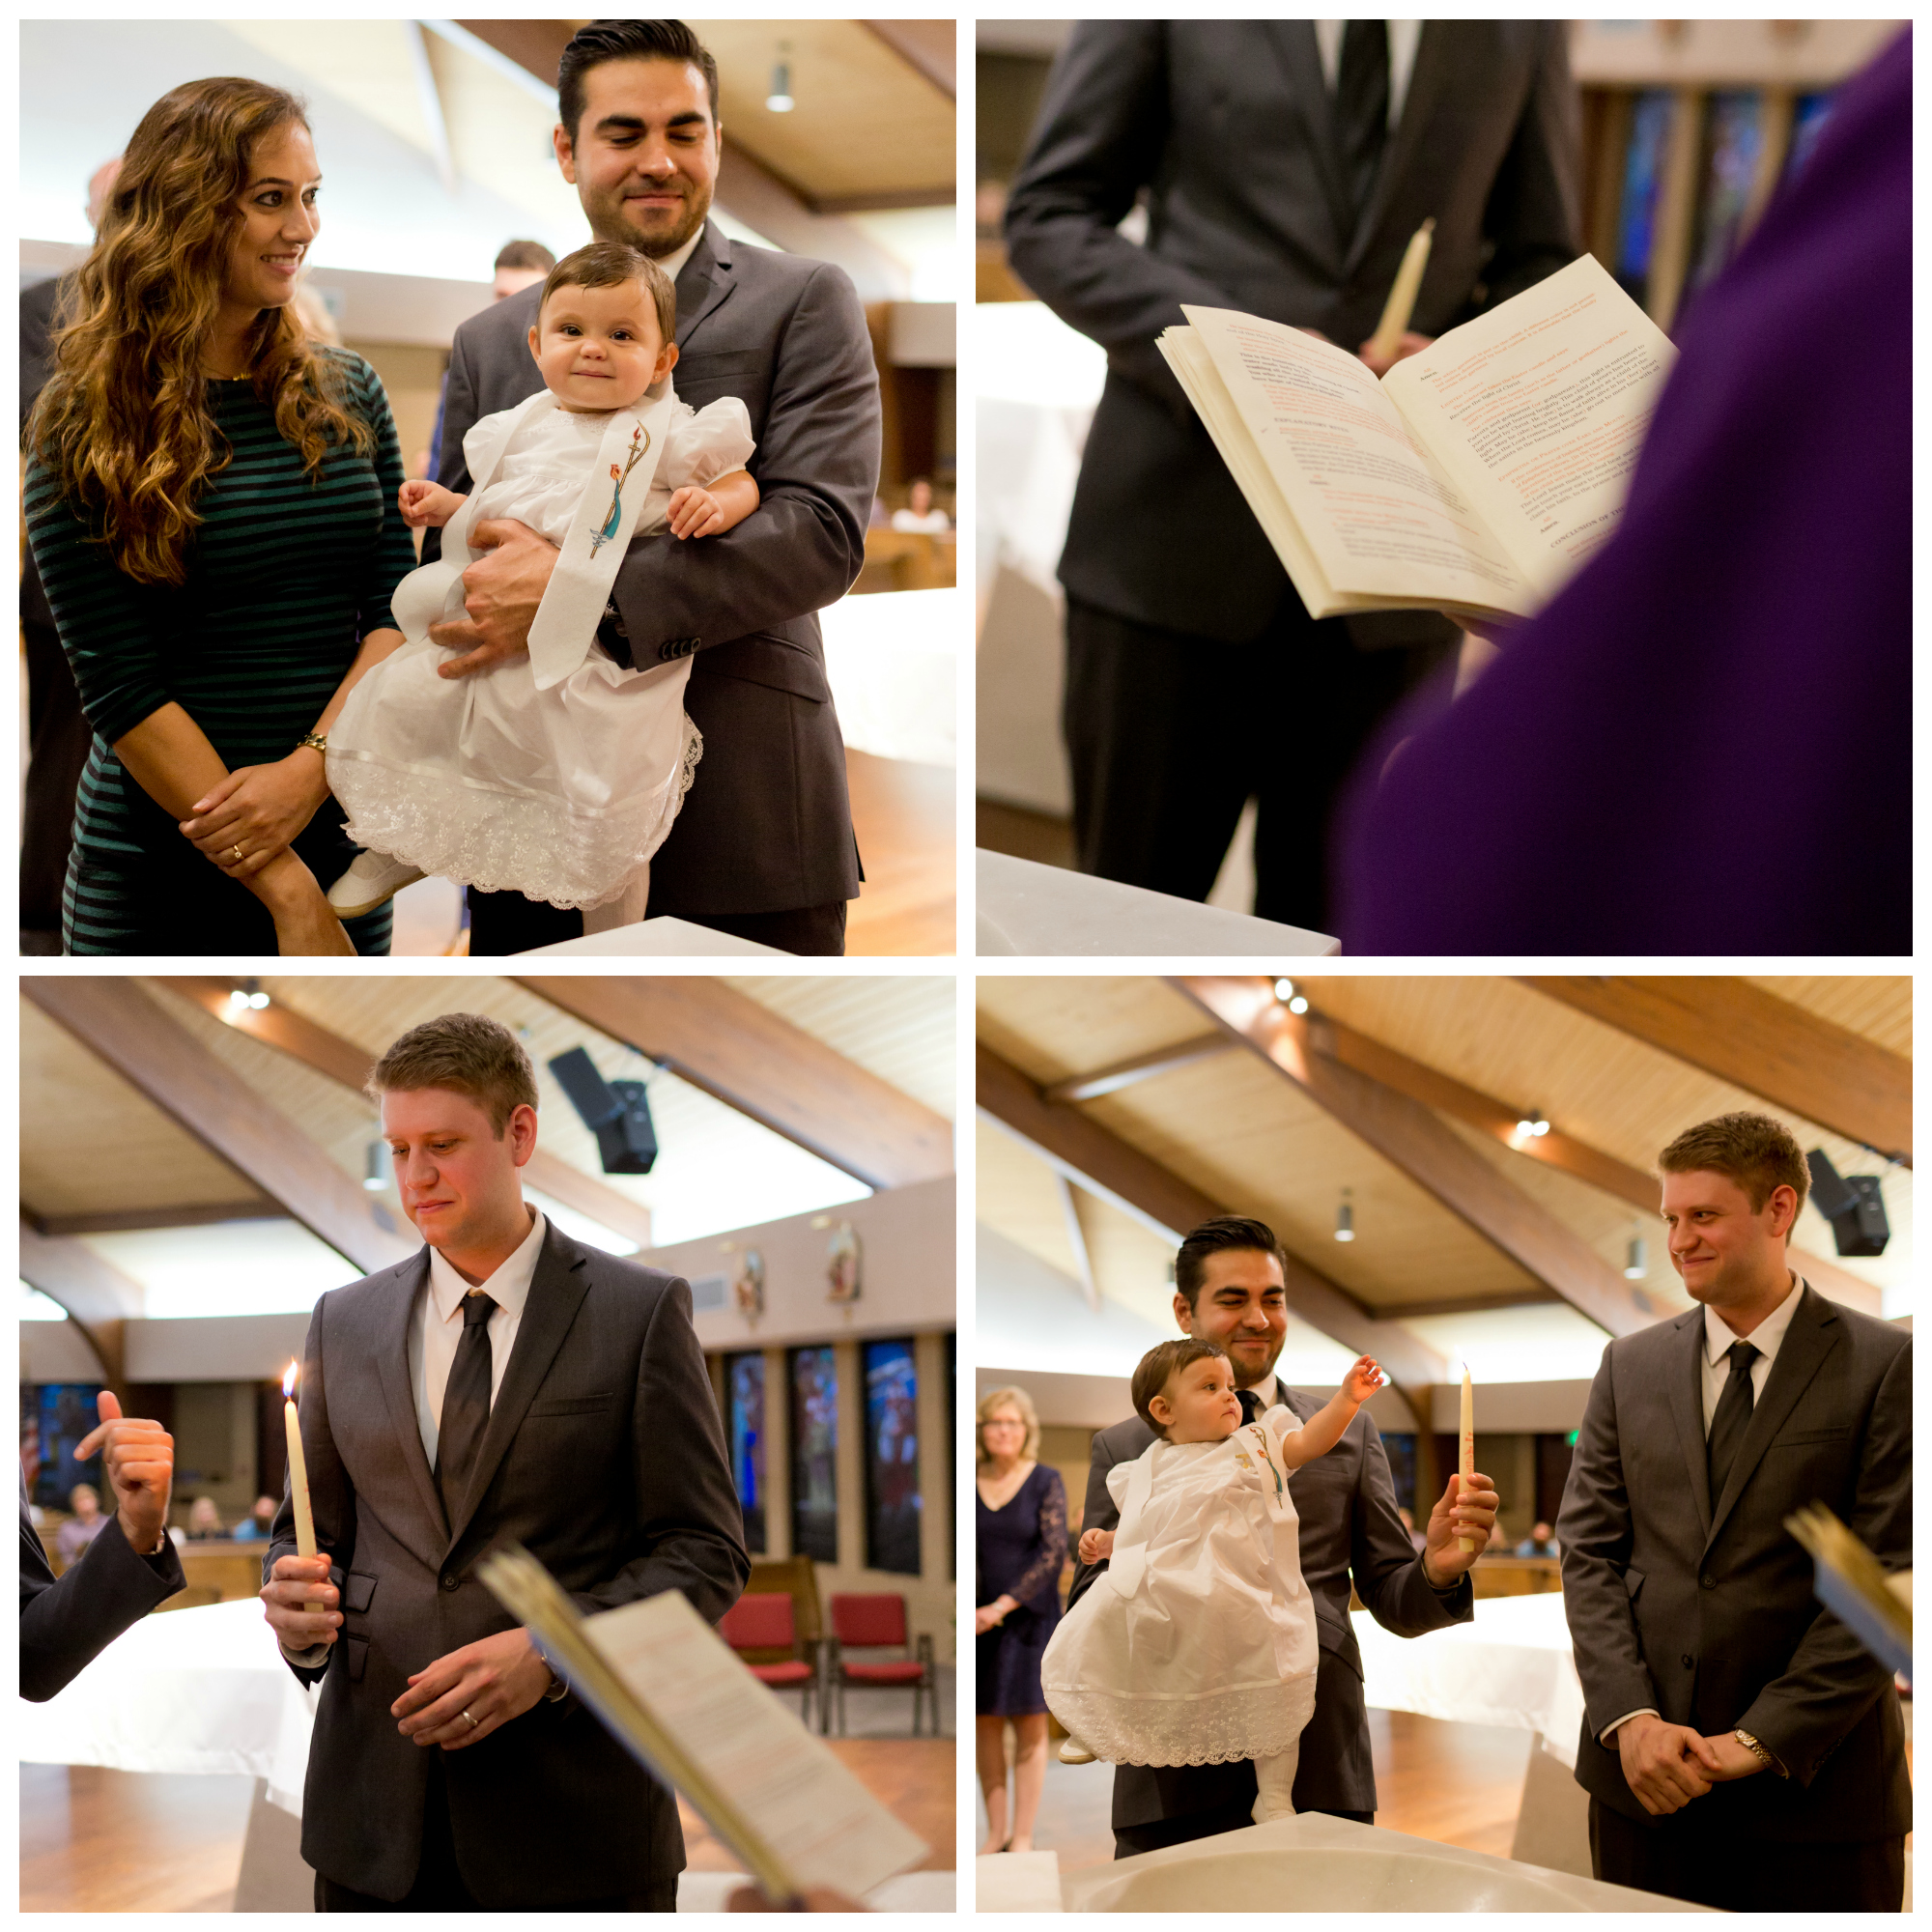 candle and stole in Catholic baptism